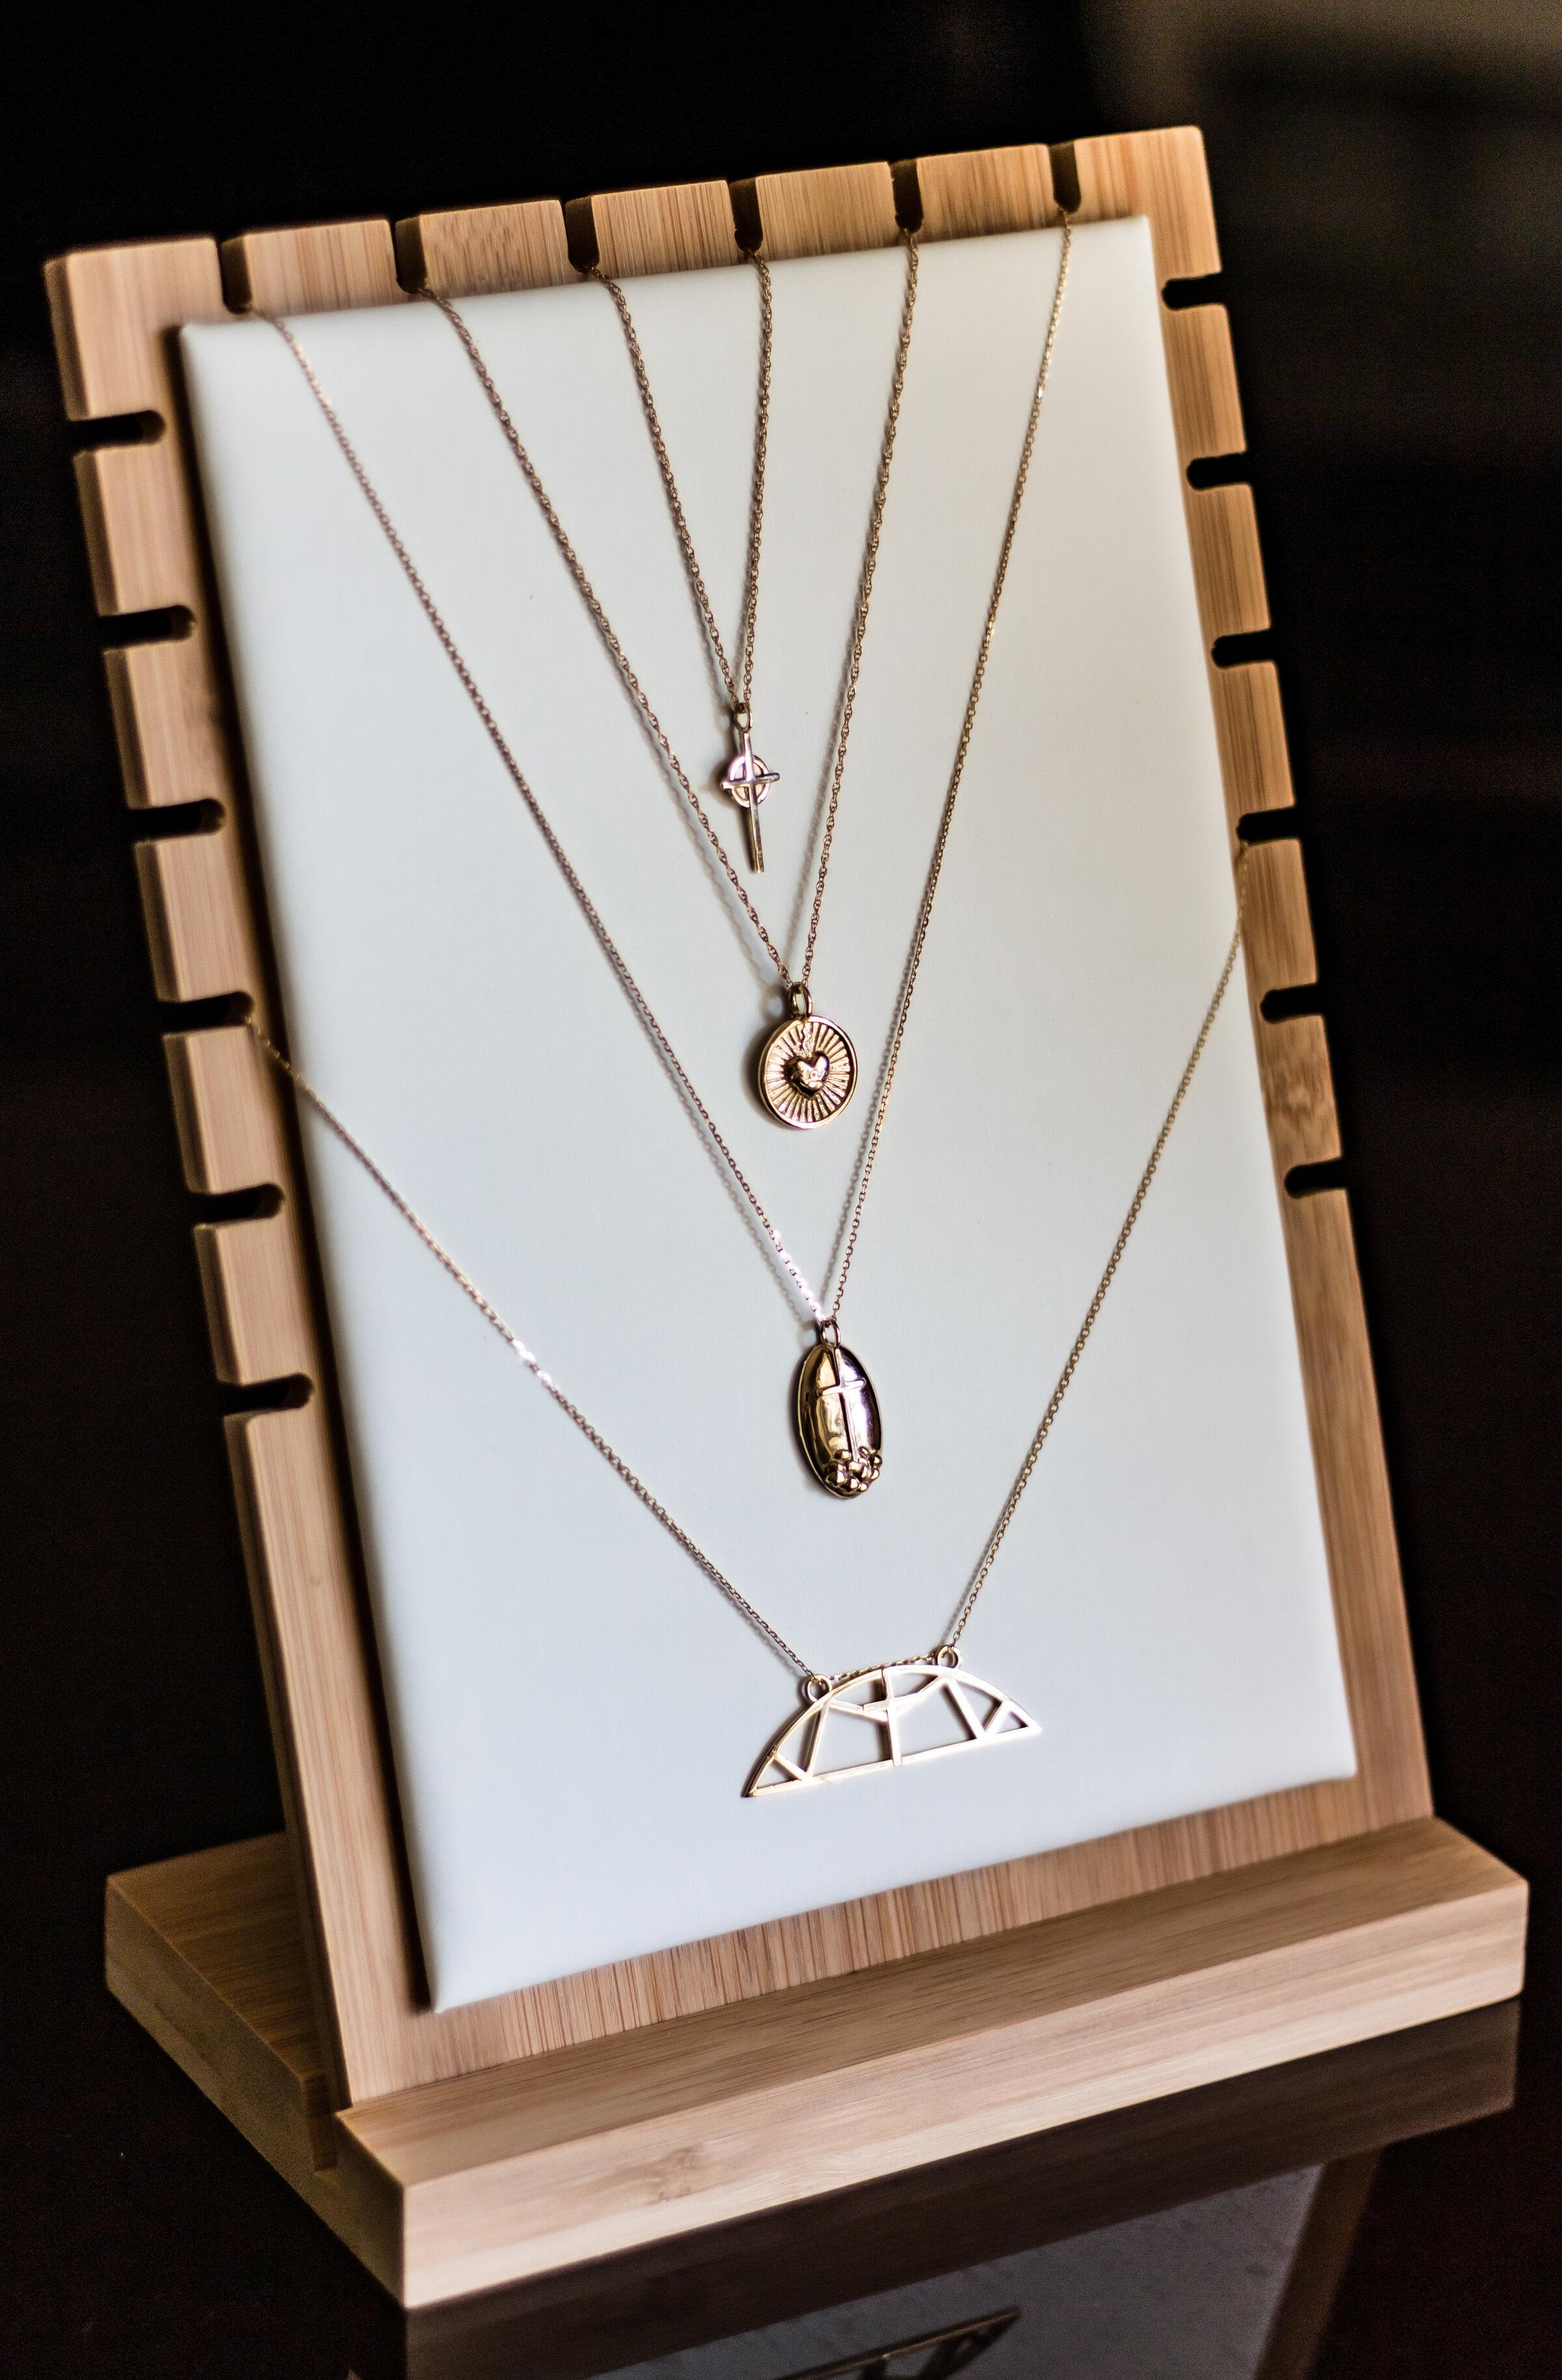 Bishop Moore Catholic Jewelry - Christ-centered artisan jewelry celebrating the Bishop Moore Catholic Community